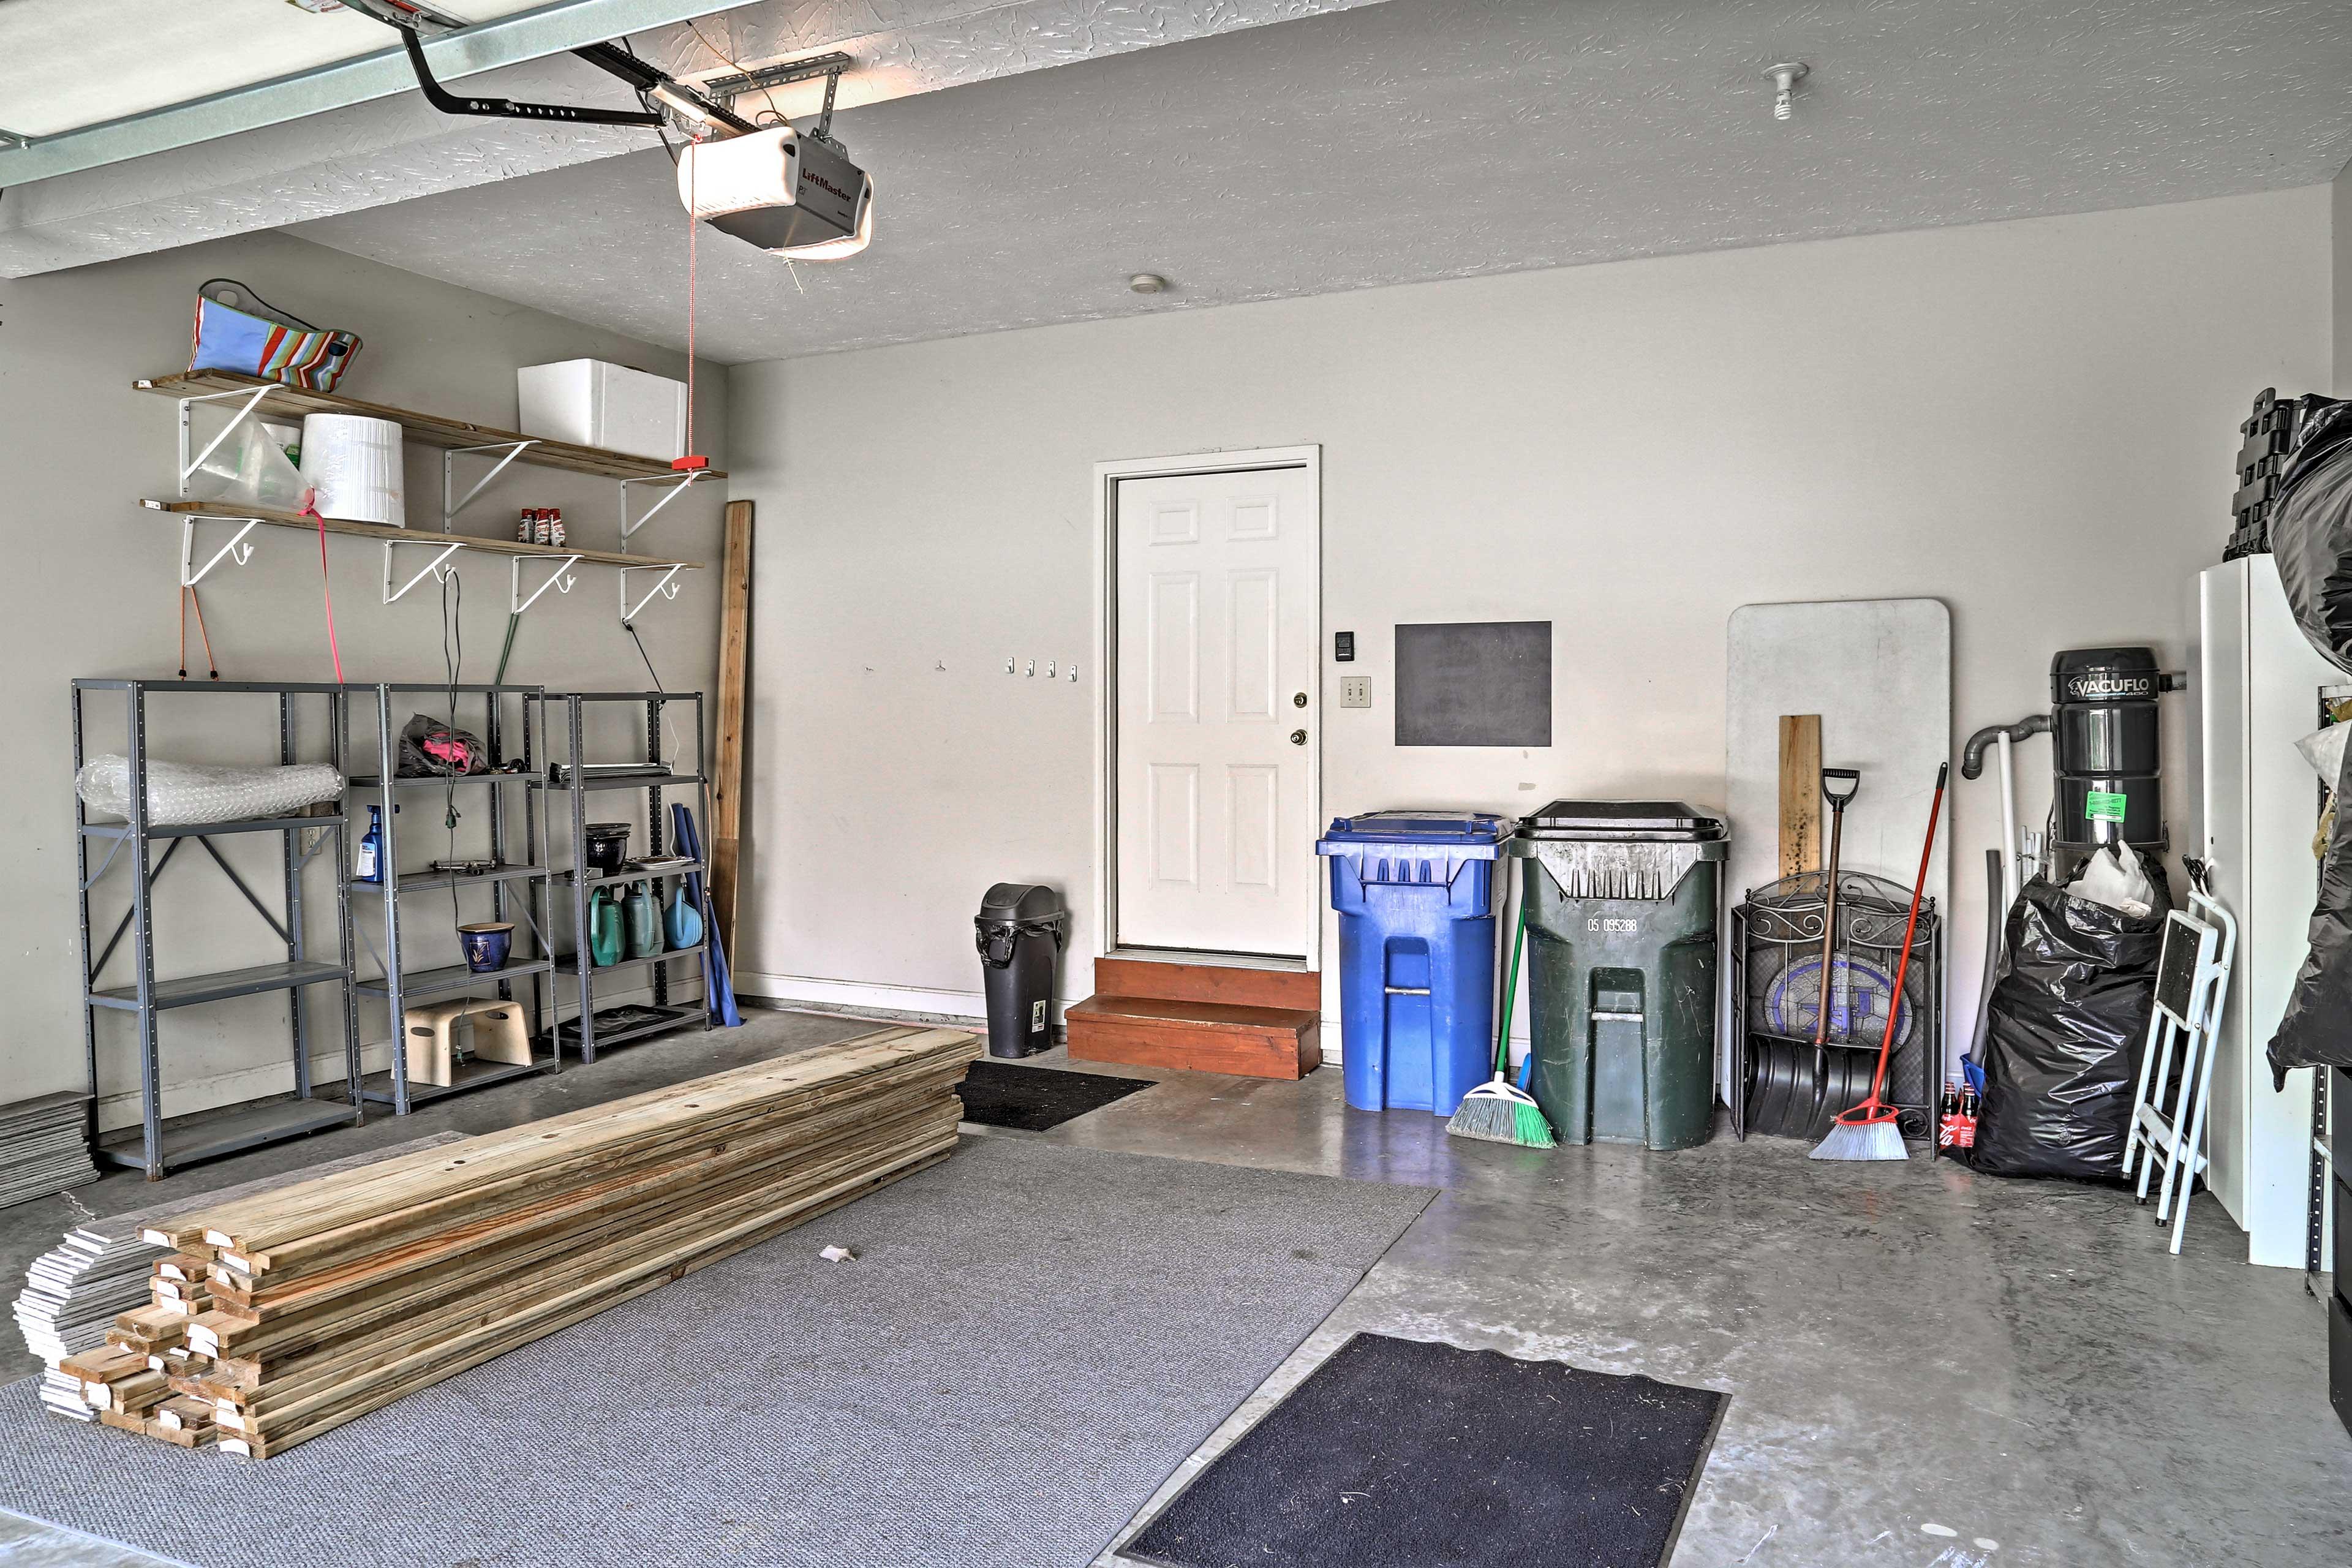 You'll find plenty of storage space in the garage.